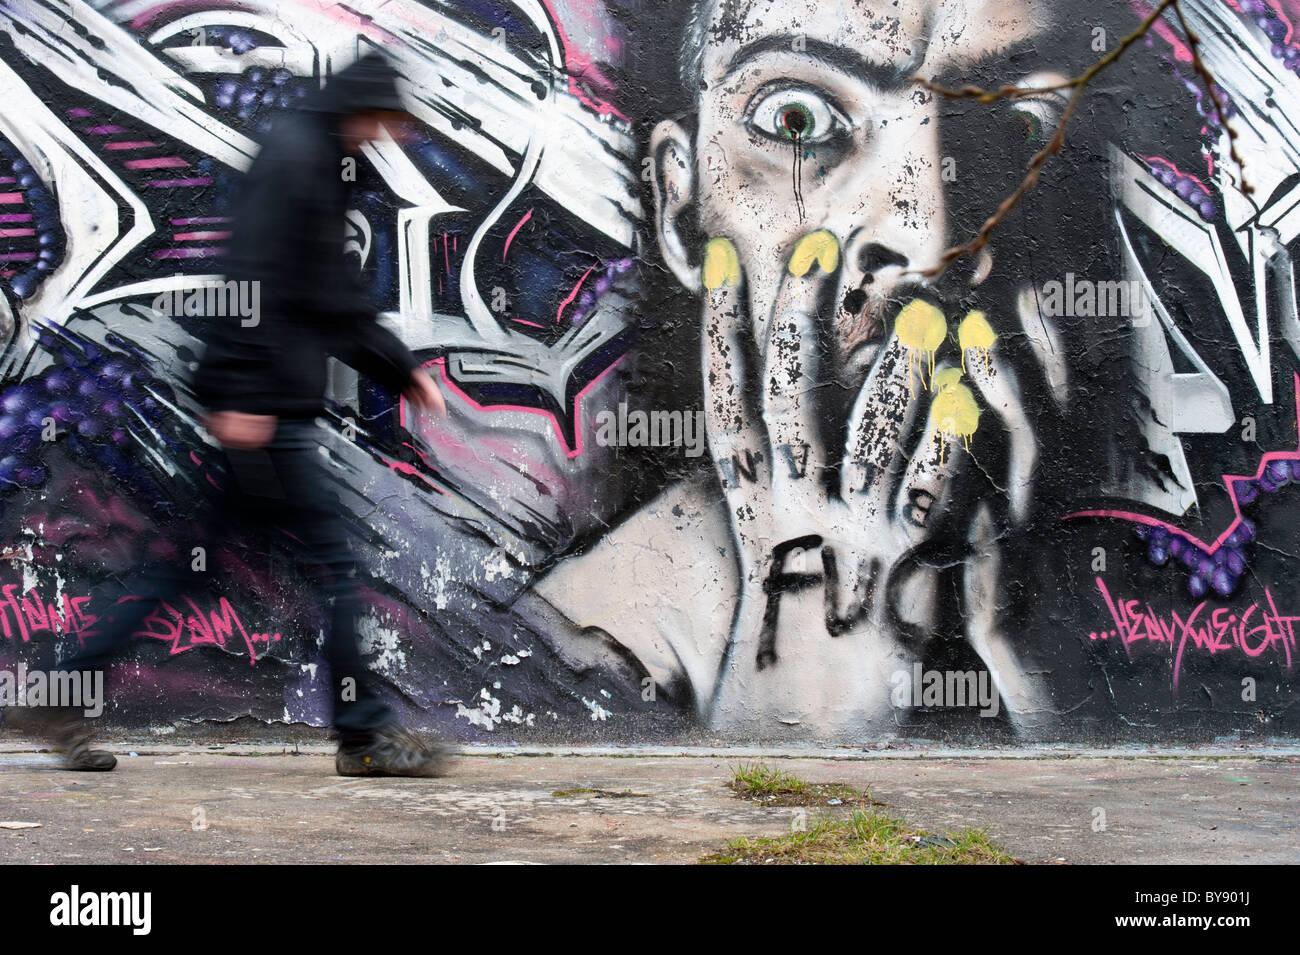 Graffiti wall chelmsford - Stock Photo Man Walking Past Graffiti Wall